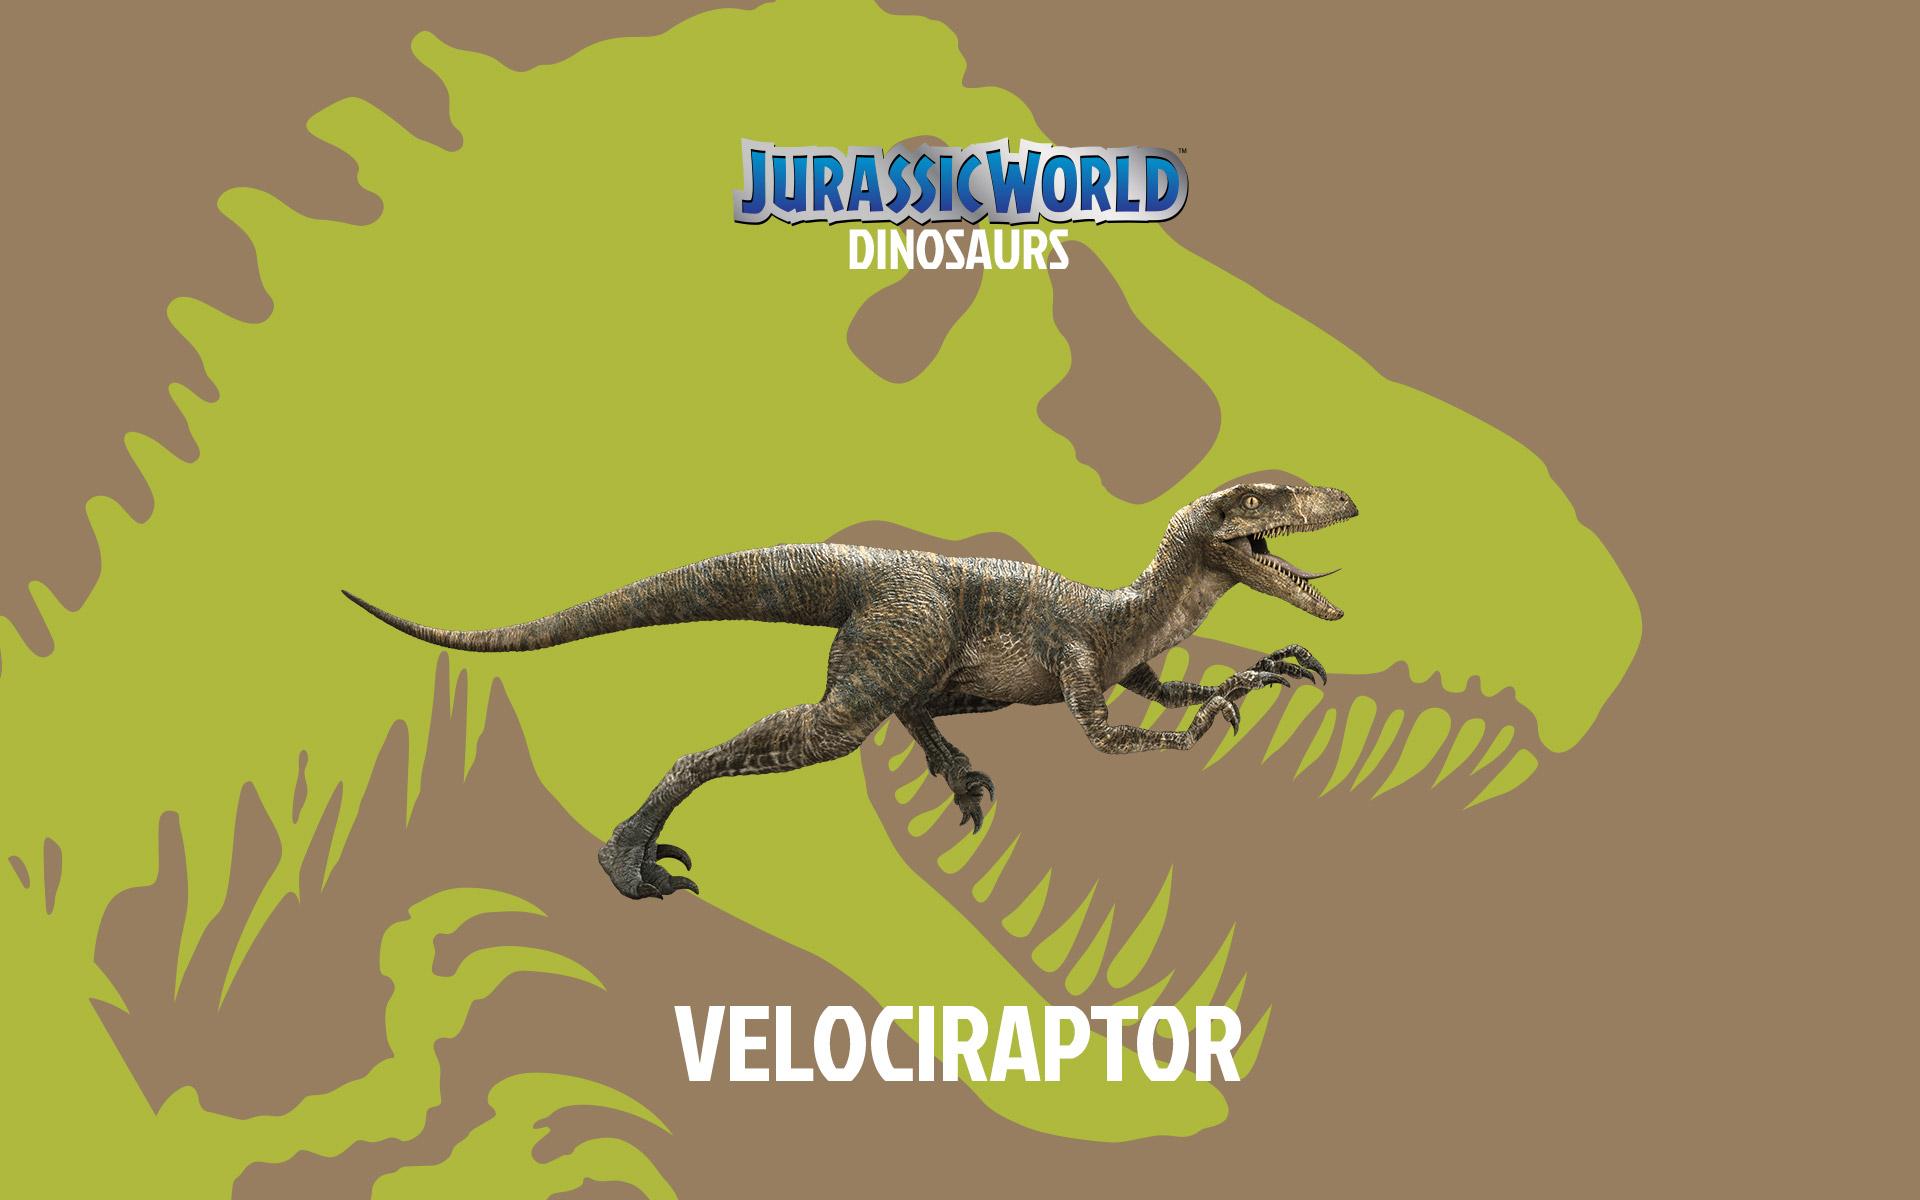 Velociraptor wallpaper for iphone wallpapersafari - Jurassic park phone wallpaper ...